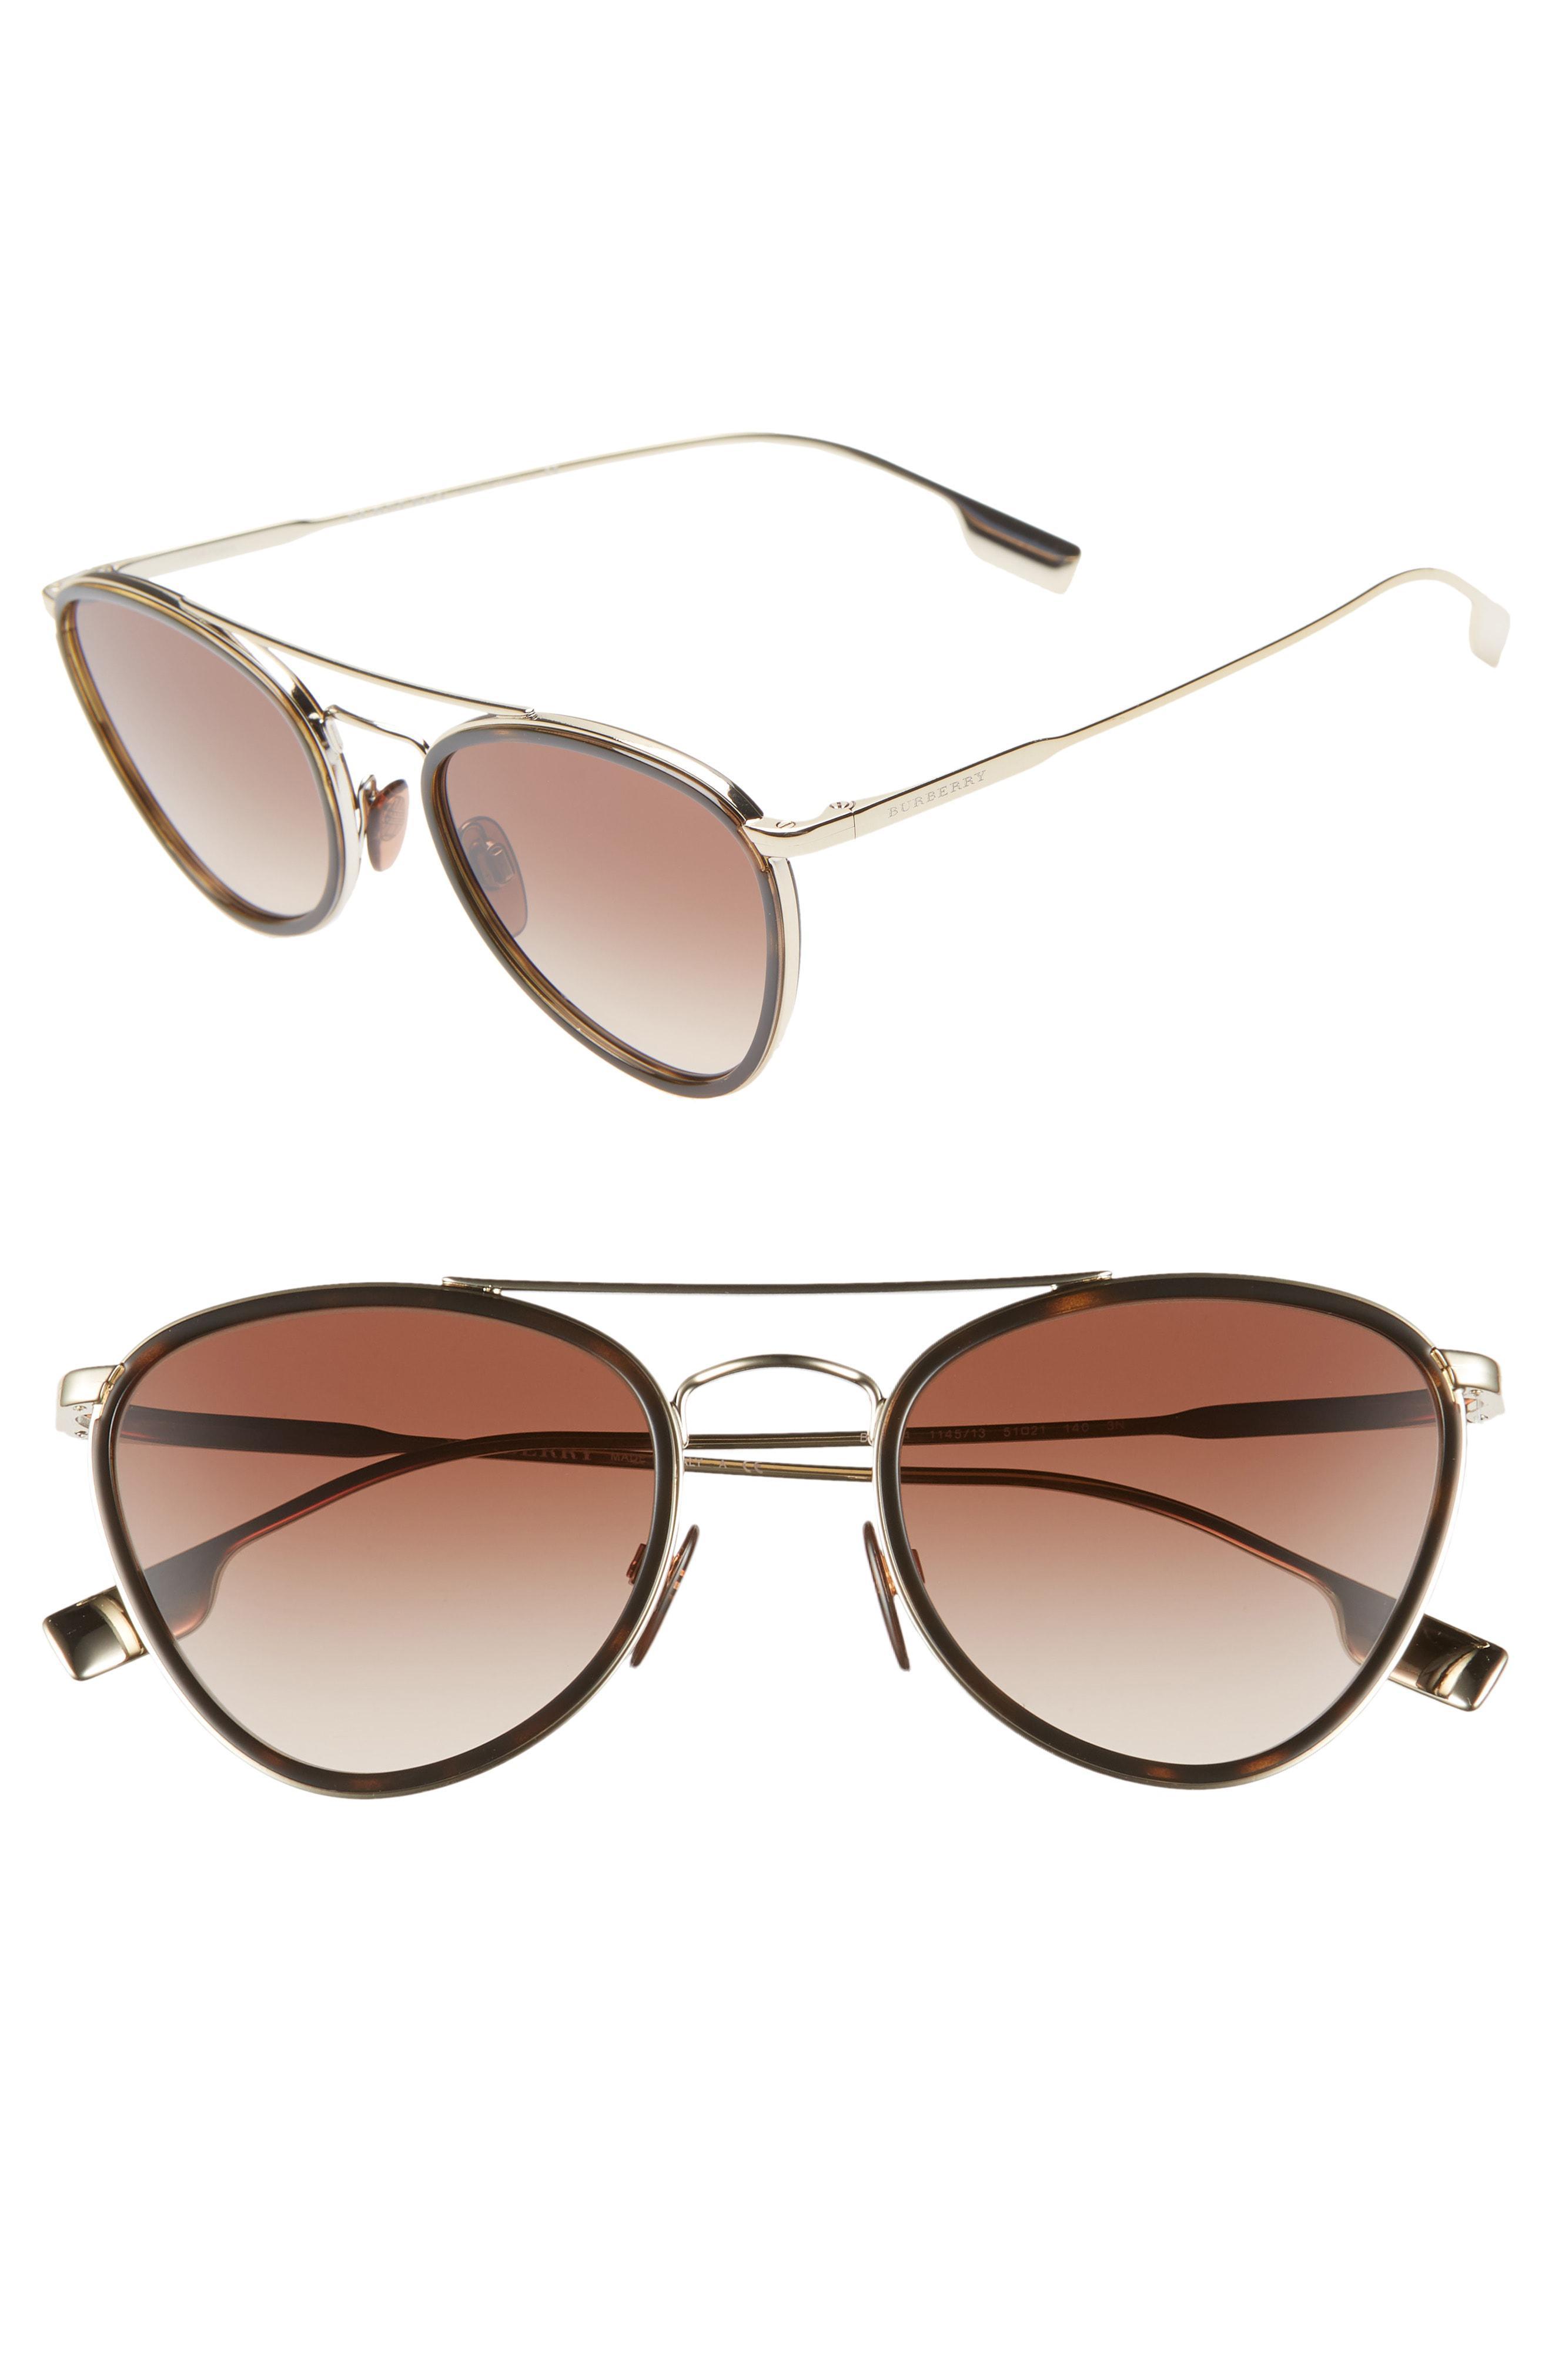 08eb6b992807 Burberry - Brown 51mm Aviator Sunglasses - Lyst. View fullscreen